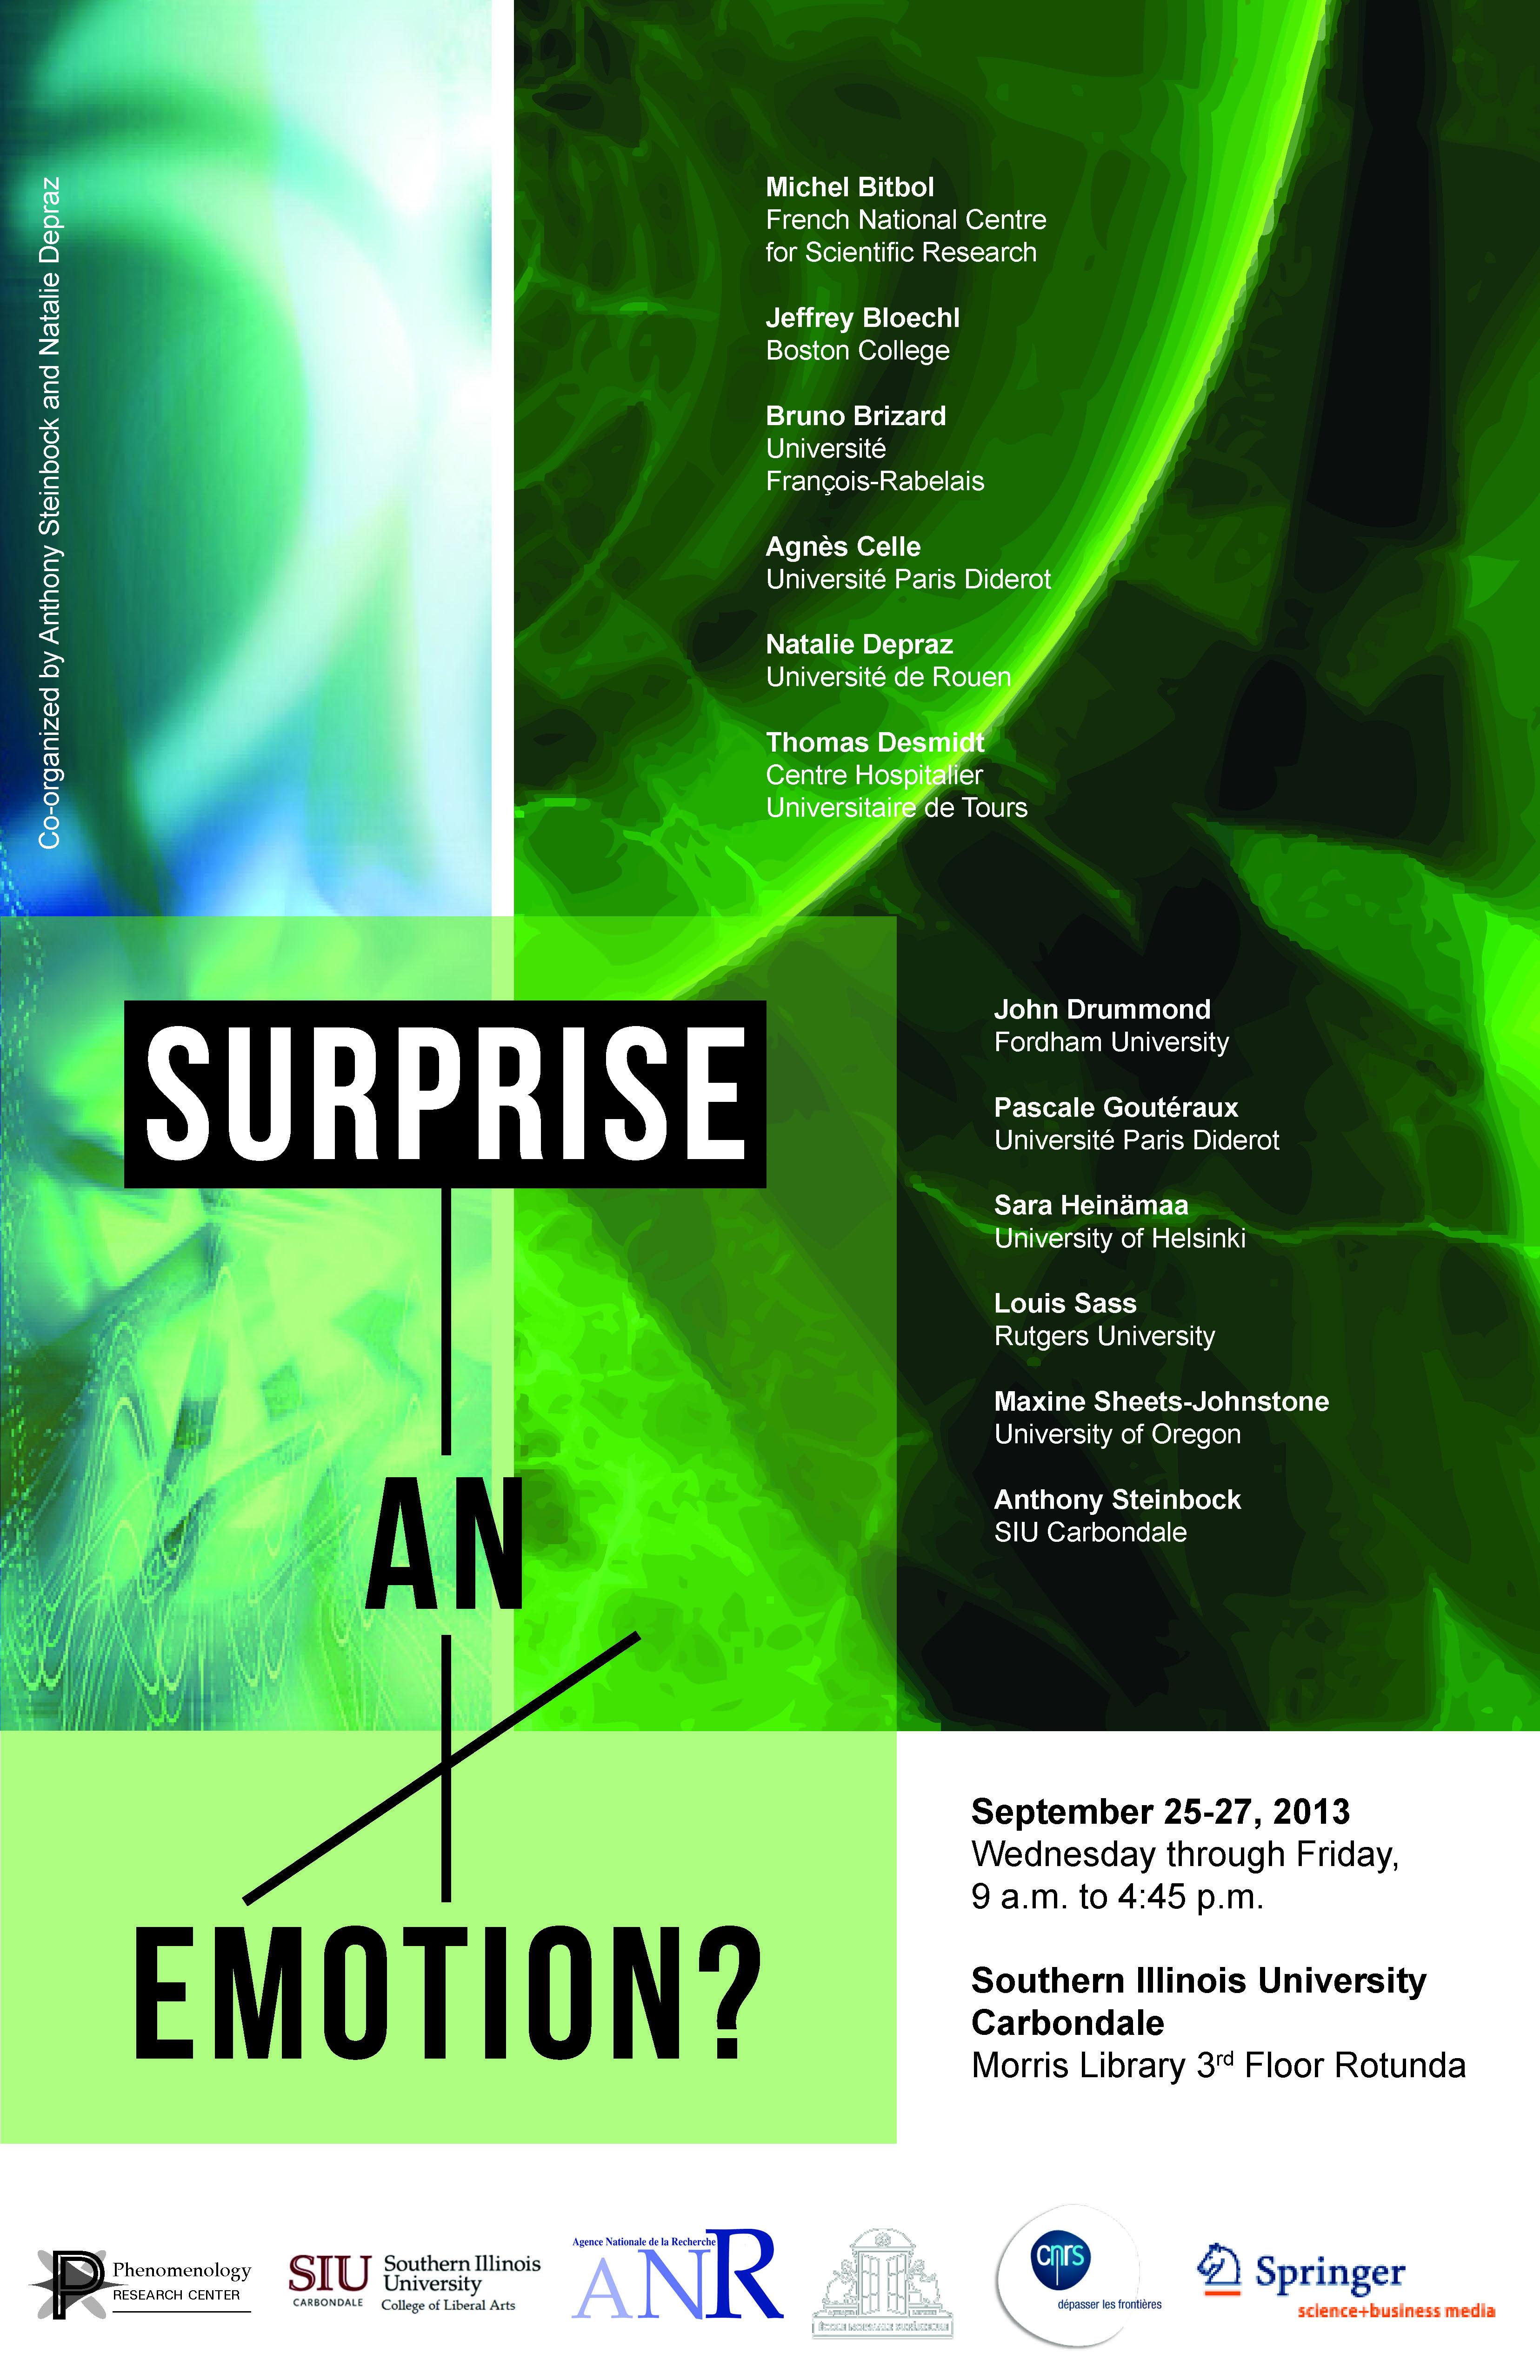 "Surprise an emotion "" conference at siu carbondale sept 25 27"